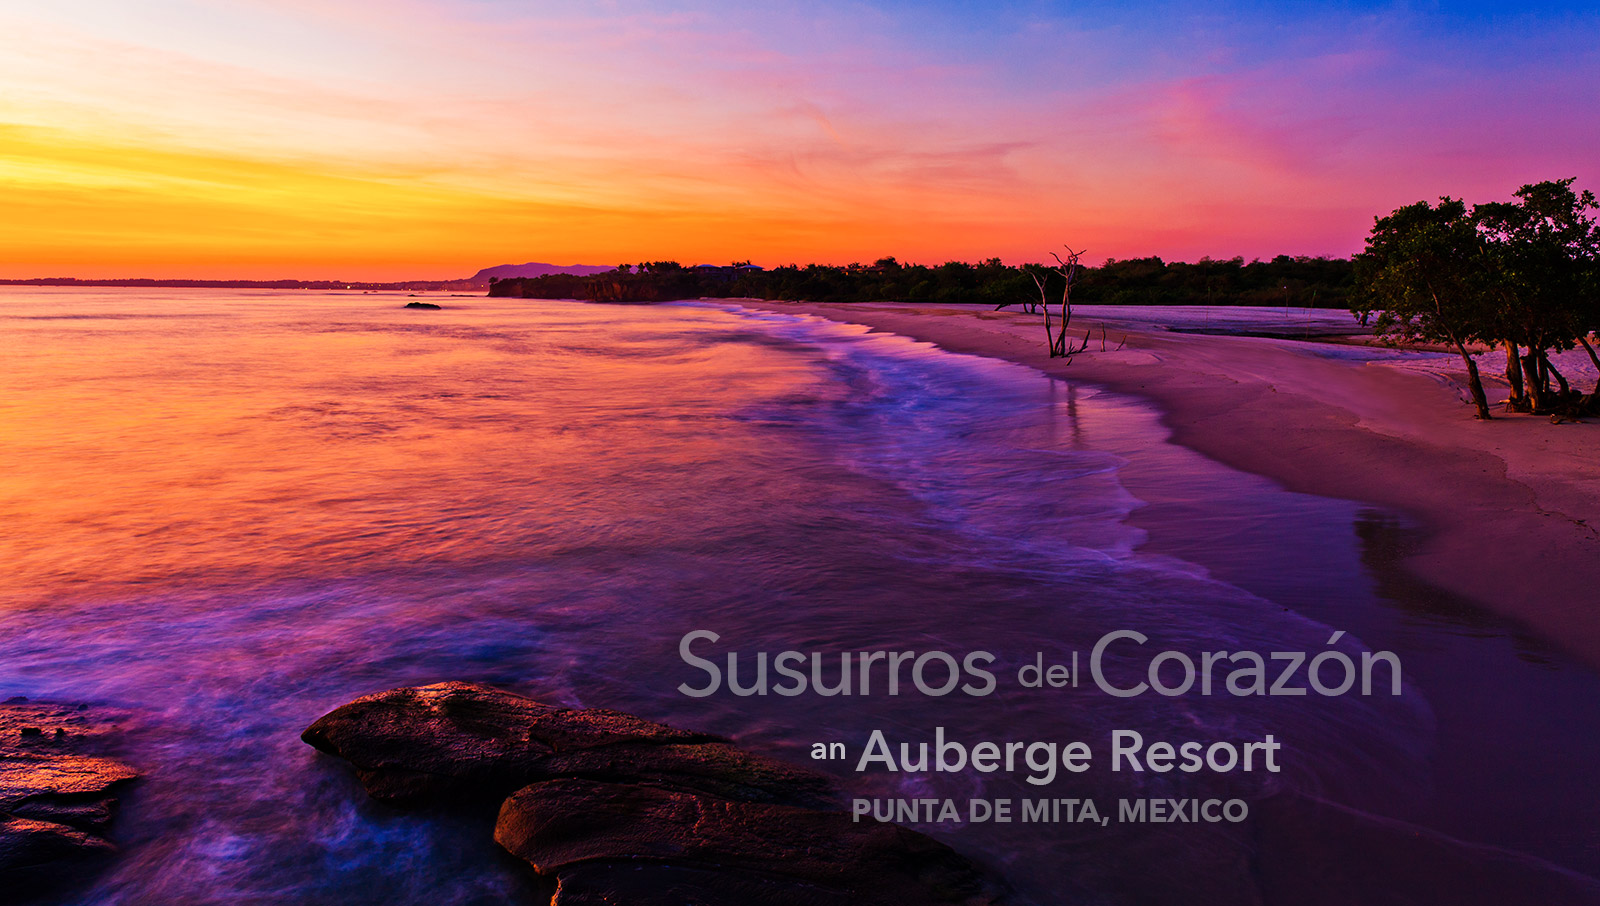 Auberge Residences, Punta de Mita, Riviera Nayarit, Mexico - Luxury beachfront resort condominiums real estate for sale